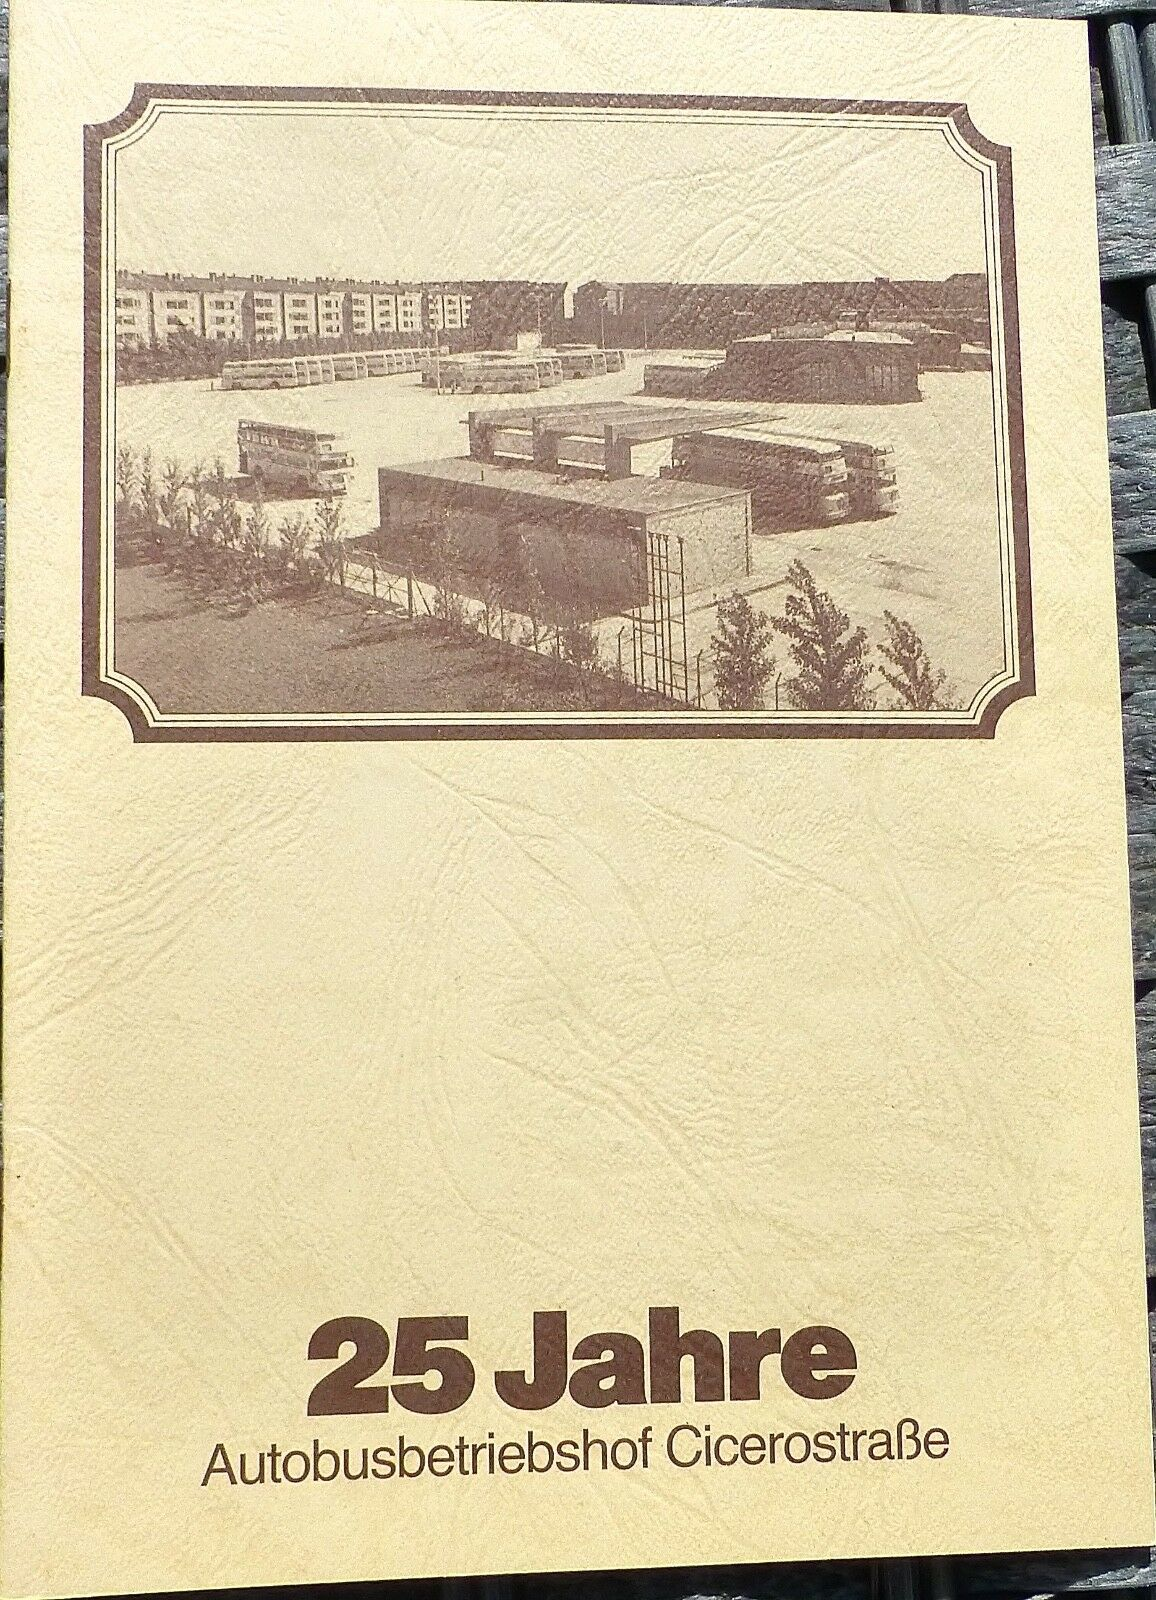 25 Years Autobusbetriebshof Cicerostraße Hn2 Å